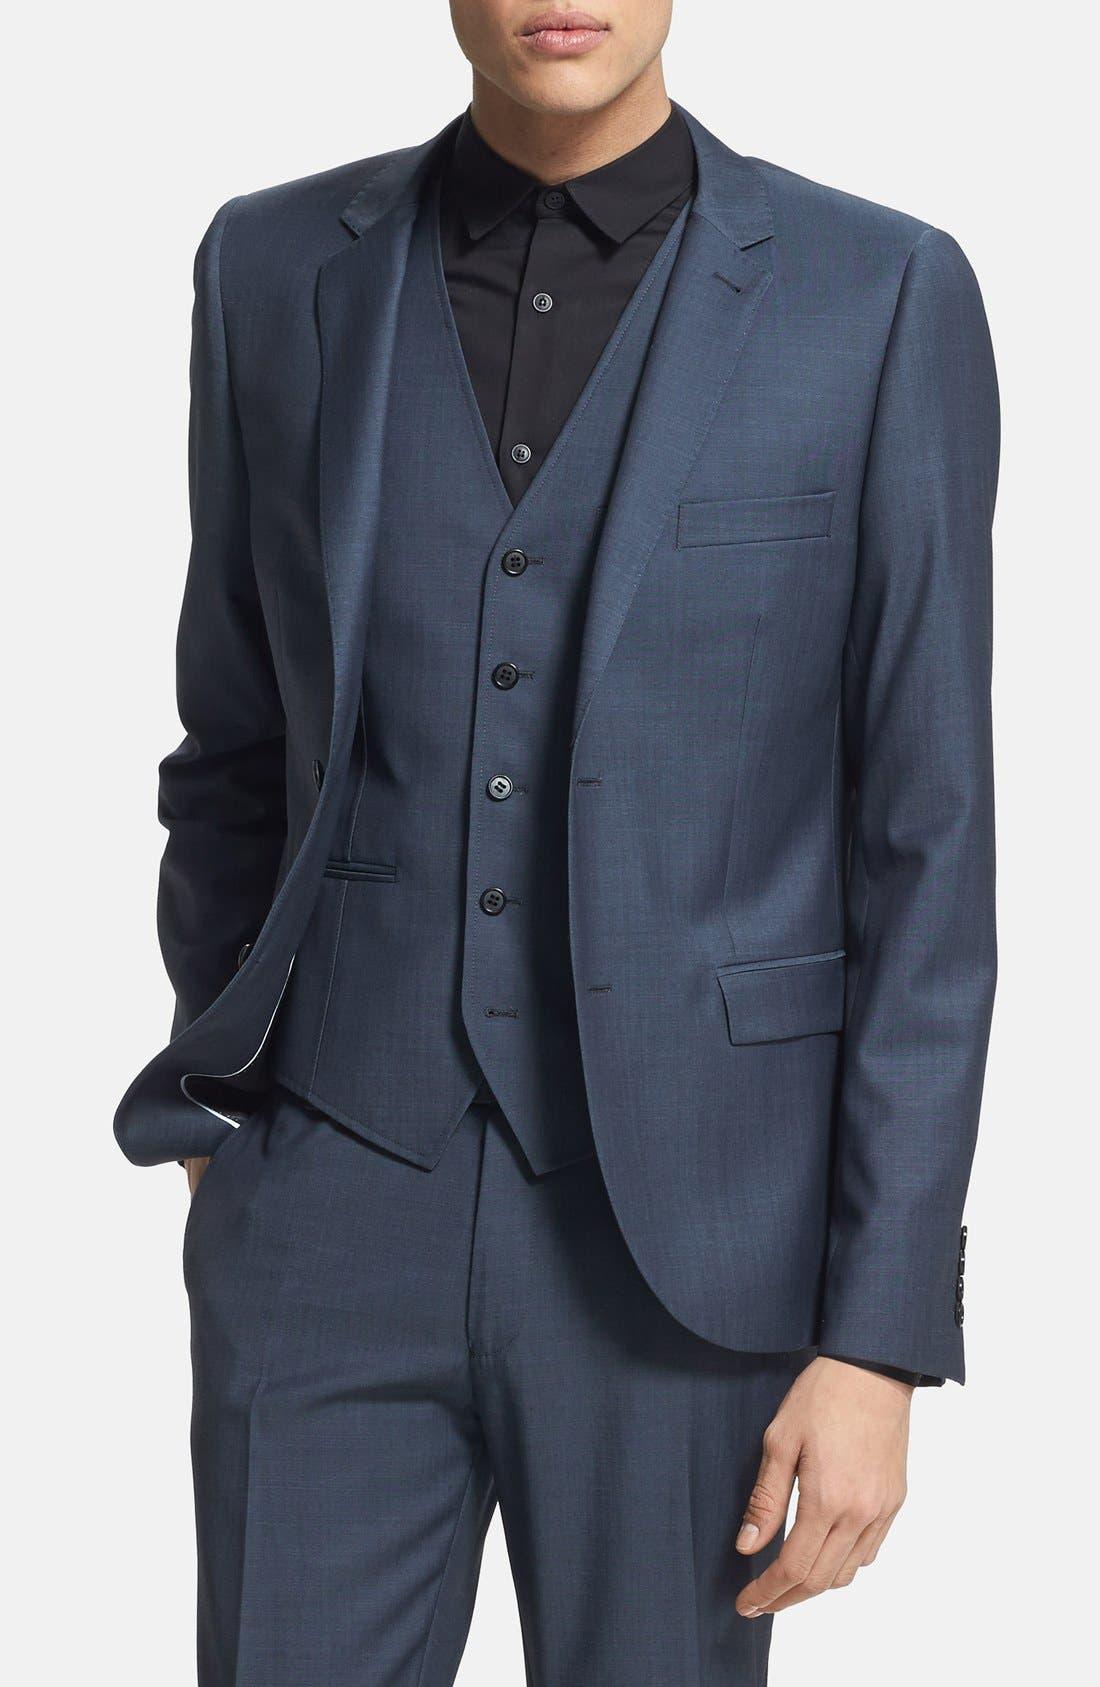 Main Image - Topman Skinny Fit Navy Suit Jacket